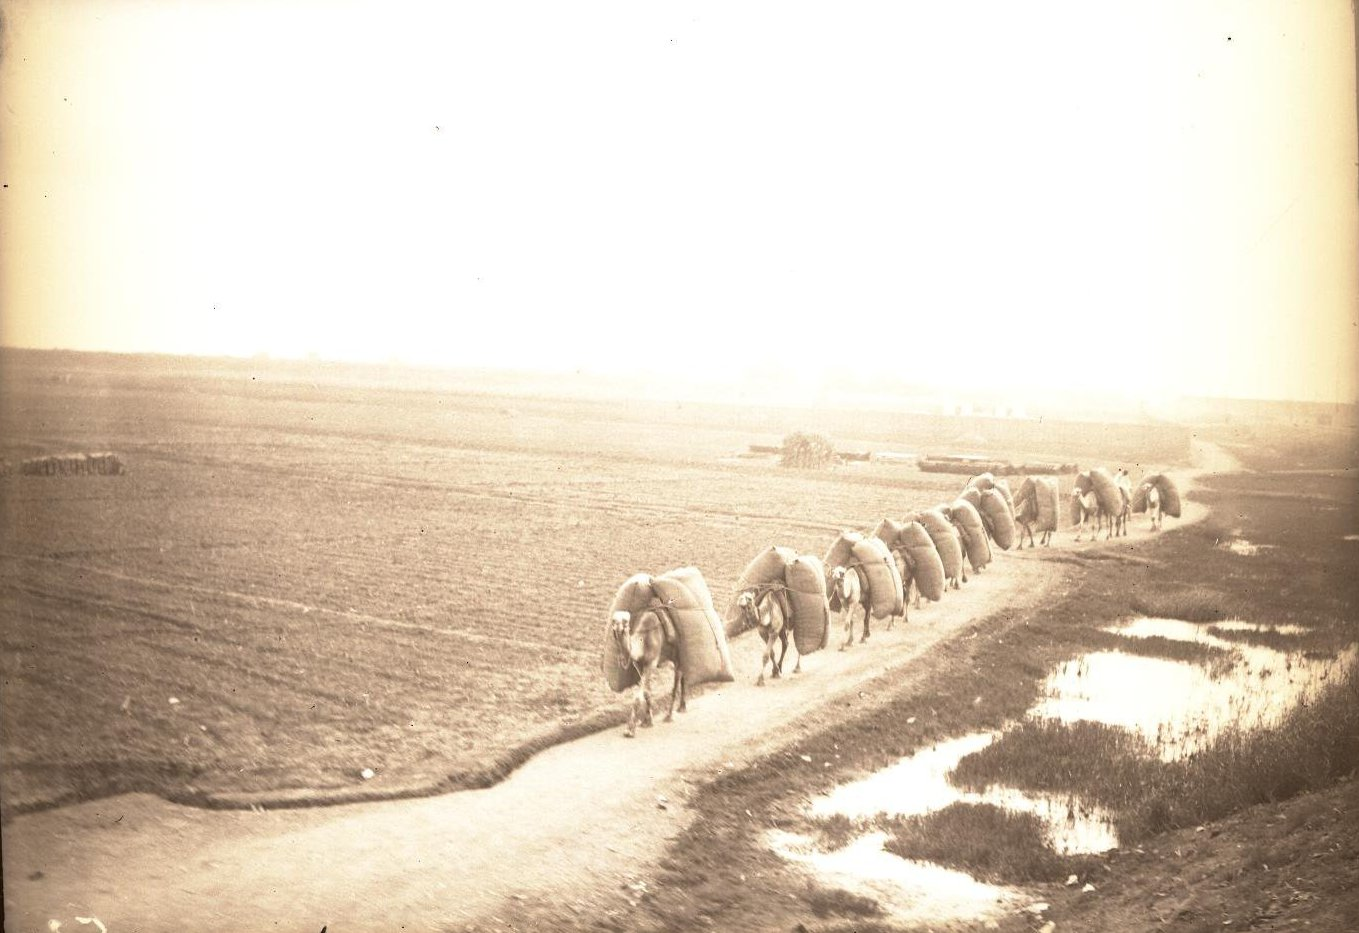 09. Египет. Измаилия. Верблюжий караван